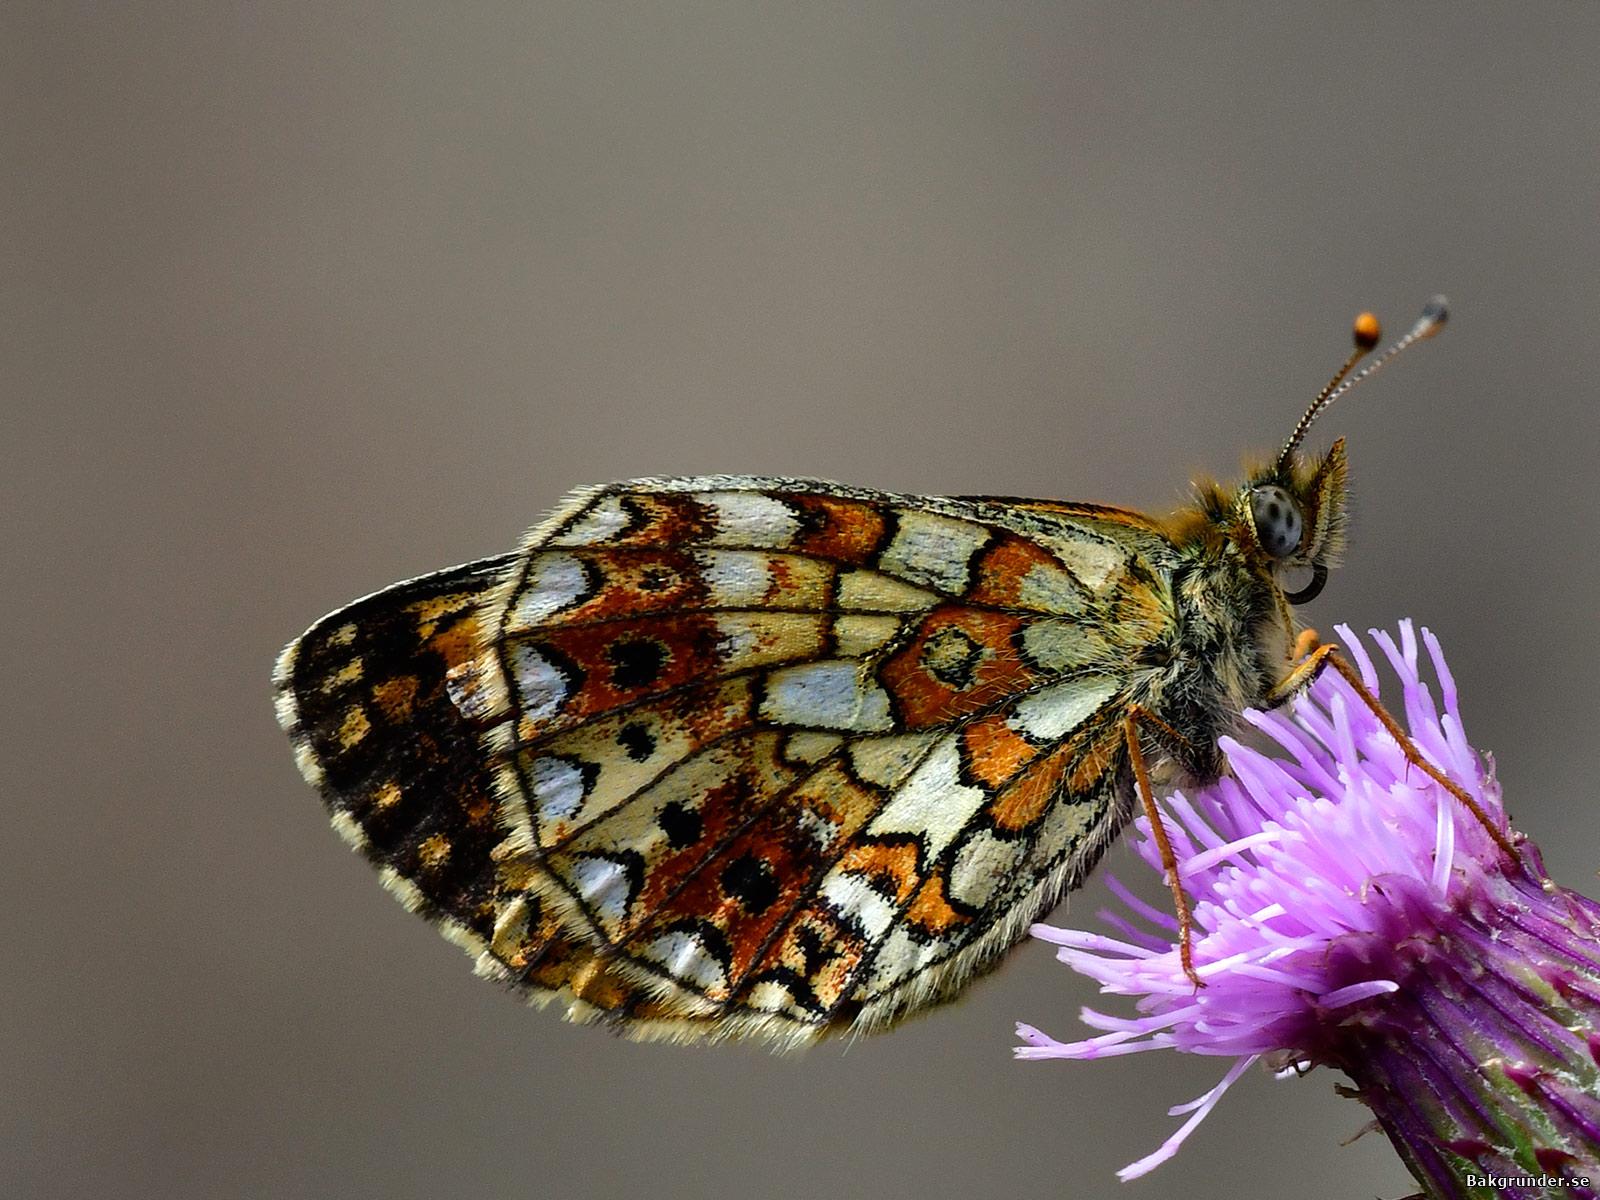 Brunfläckig pärlemorfjäril Boloria selene